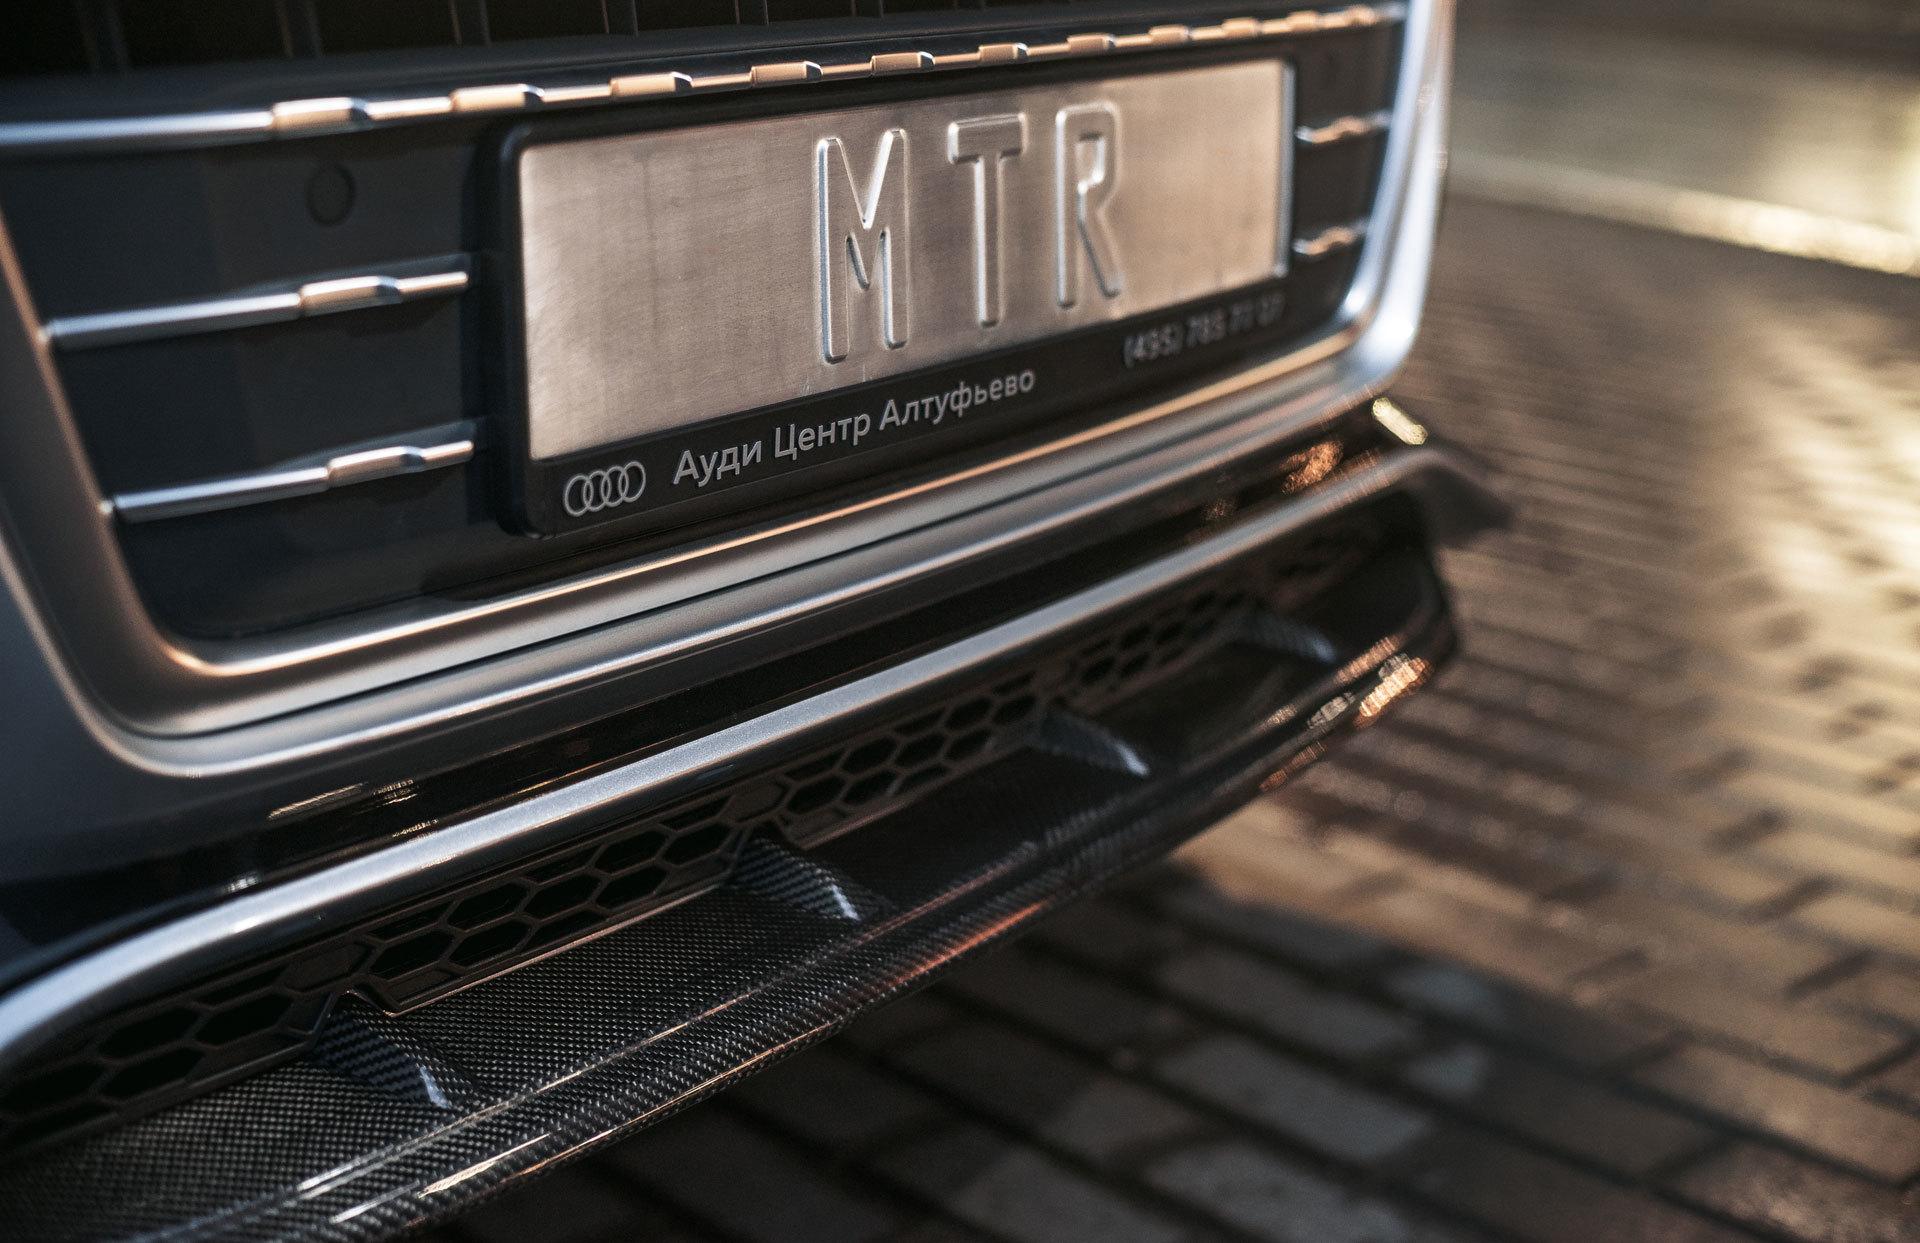 MTR Design